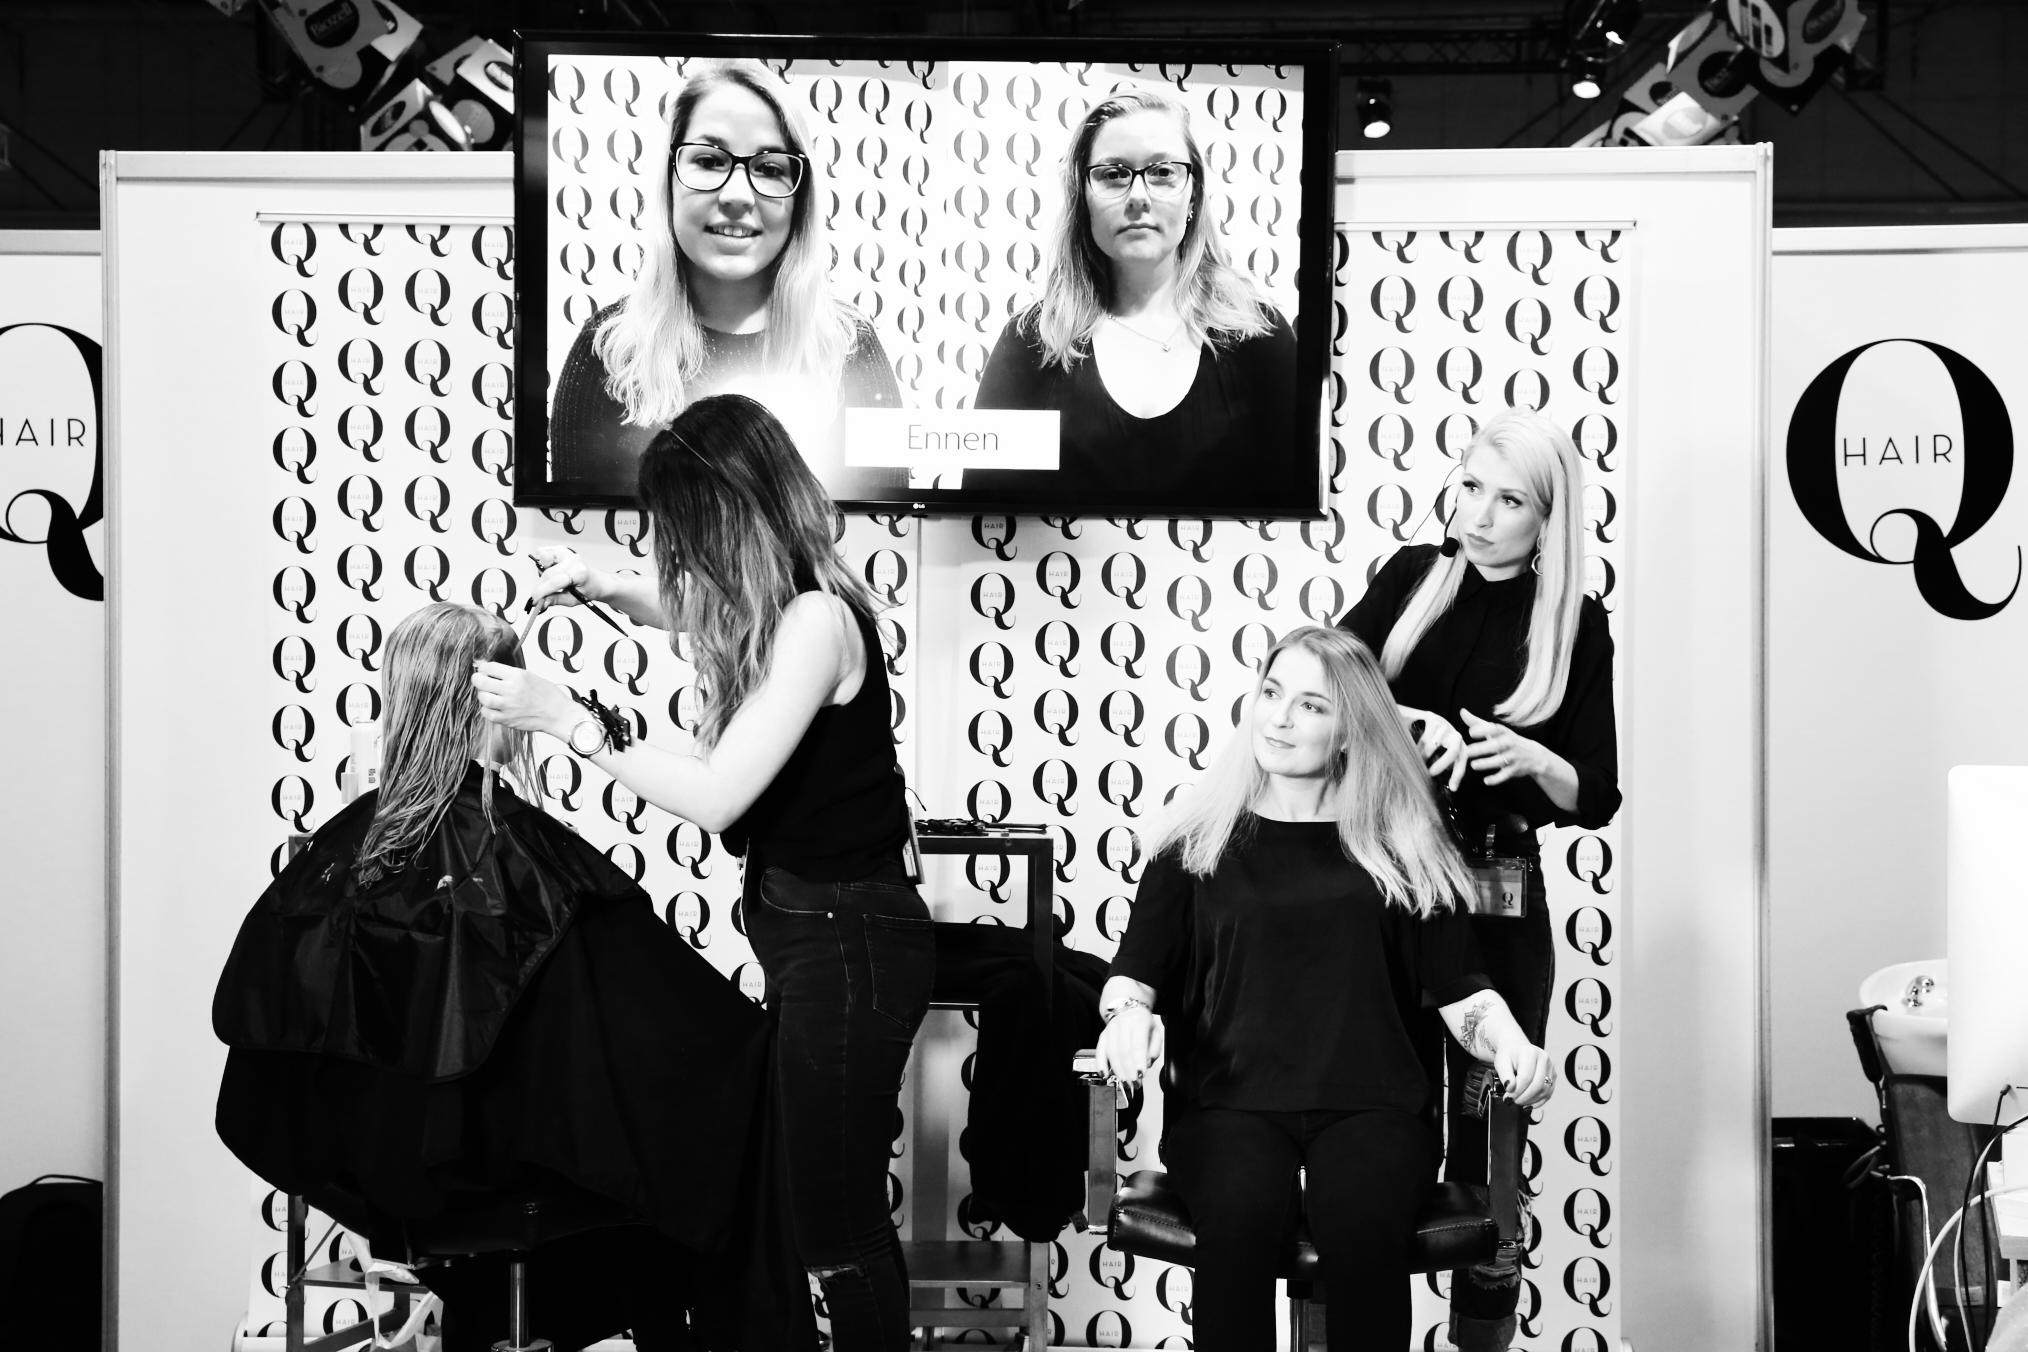 Q_Hair_Jälkeen 54